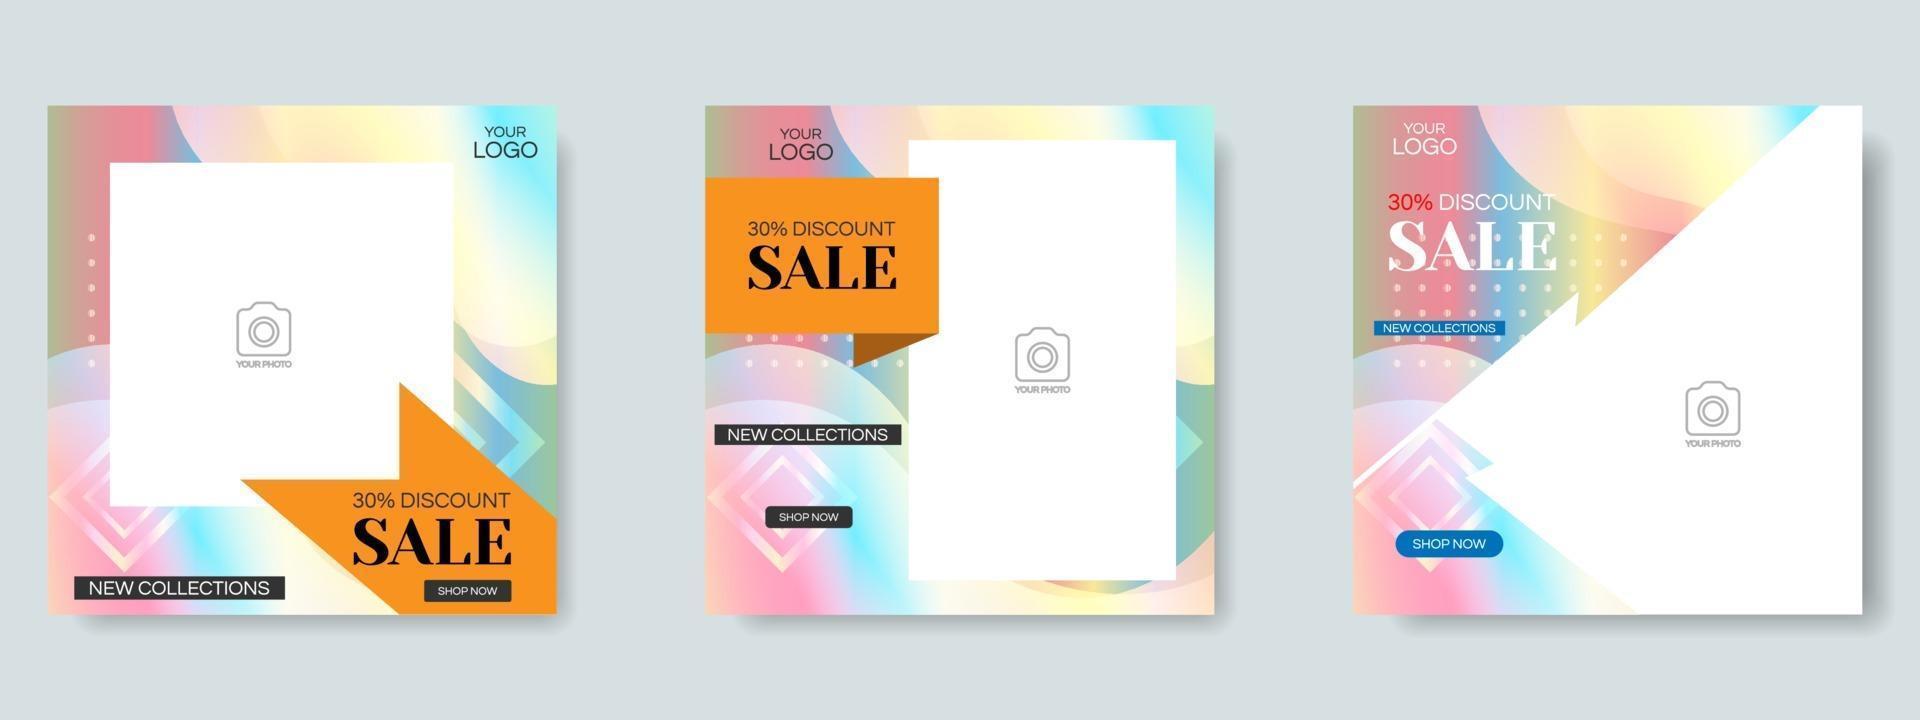 modelo de design de postagem de mídia social de venda de moda. vetor de banner da web